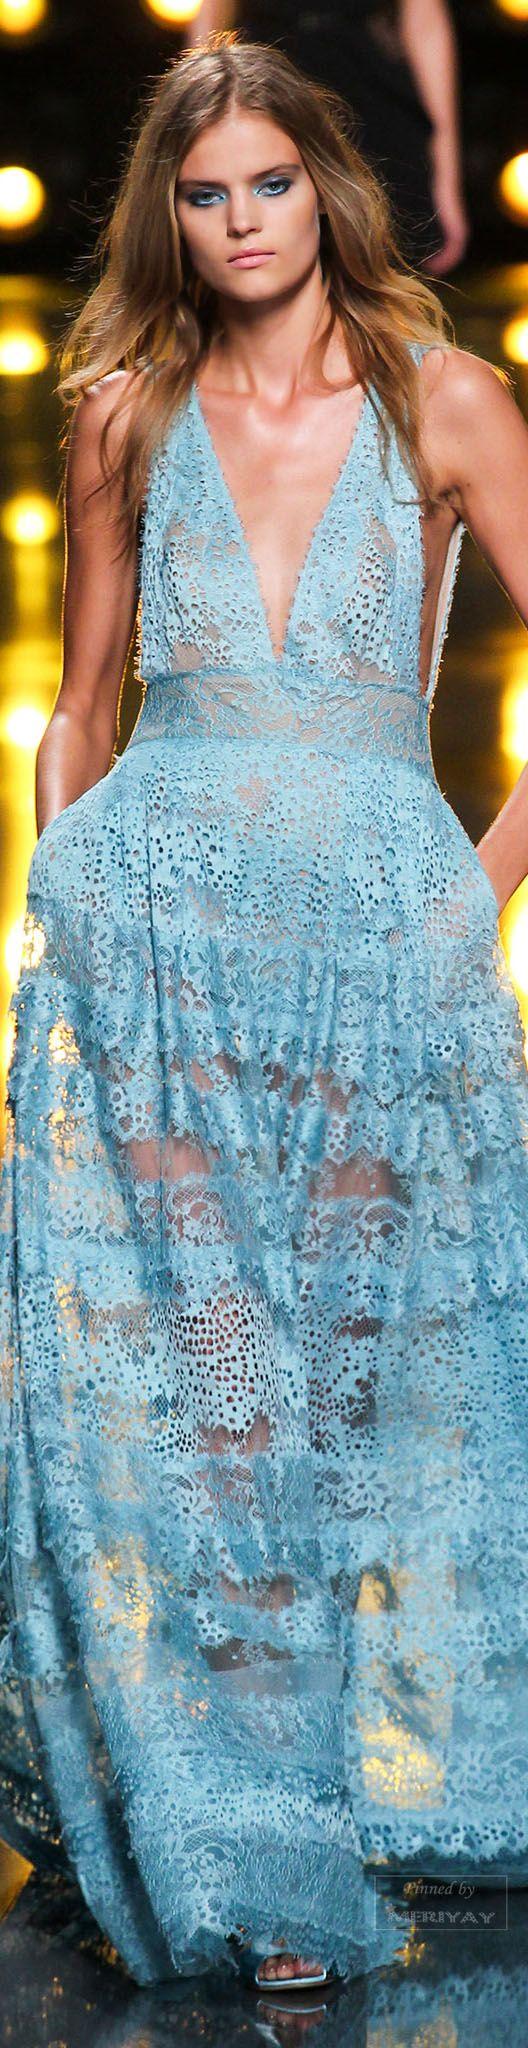 337 best Art of Fashion: Elie Saab images on Pinterest   Cute ...